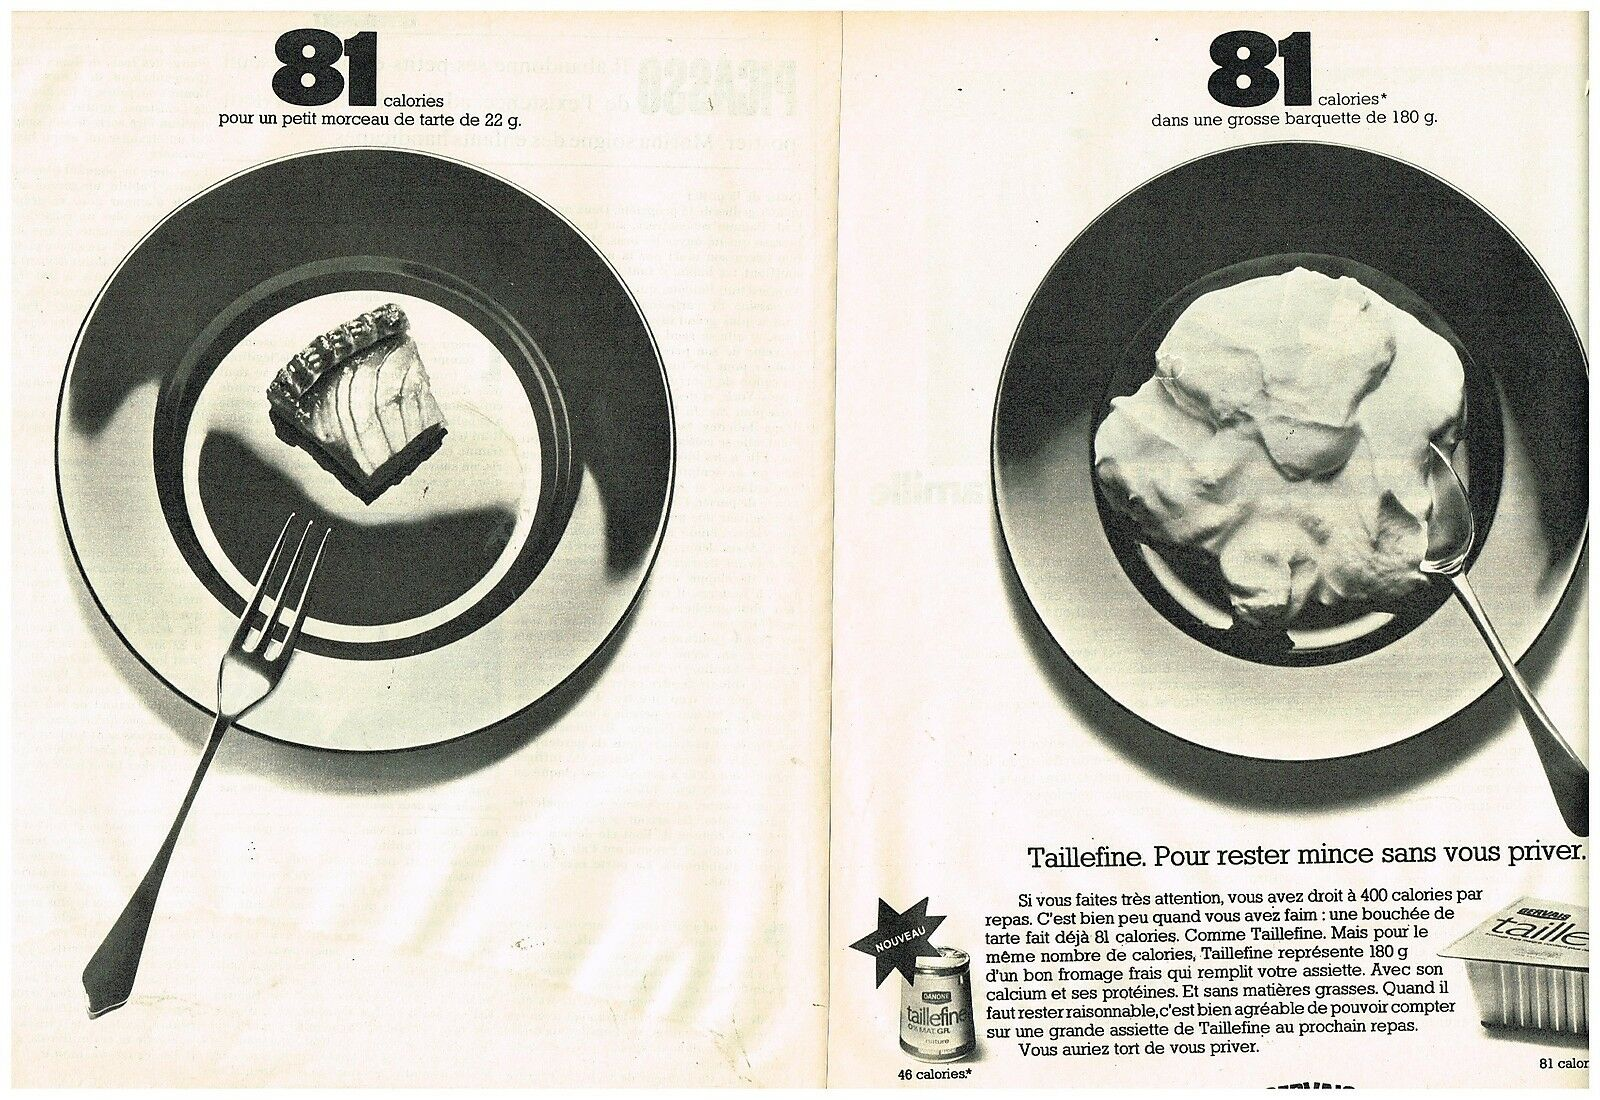 1973 Desserts Taillefine de Gervais